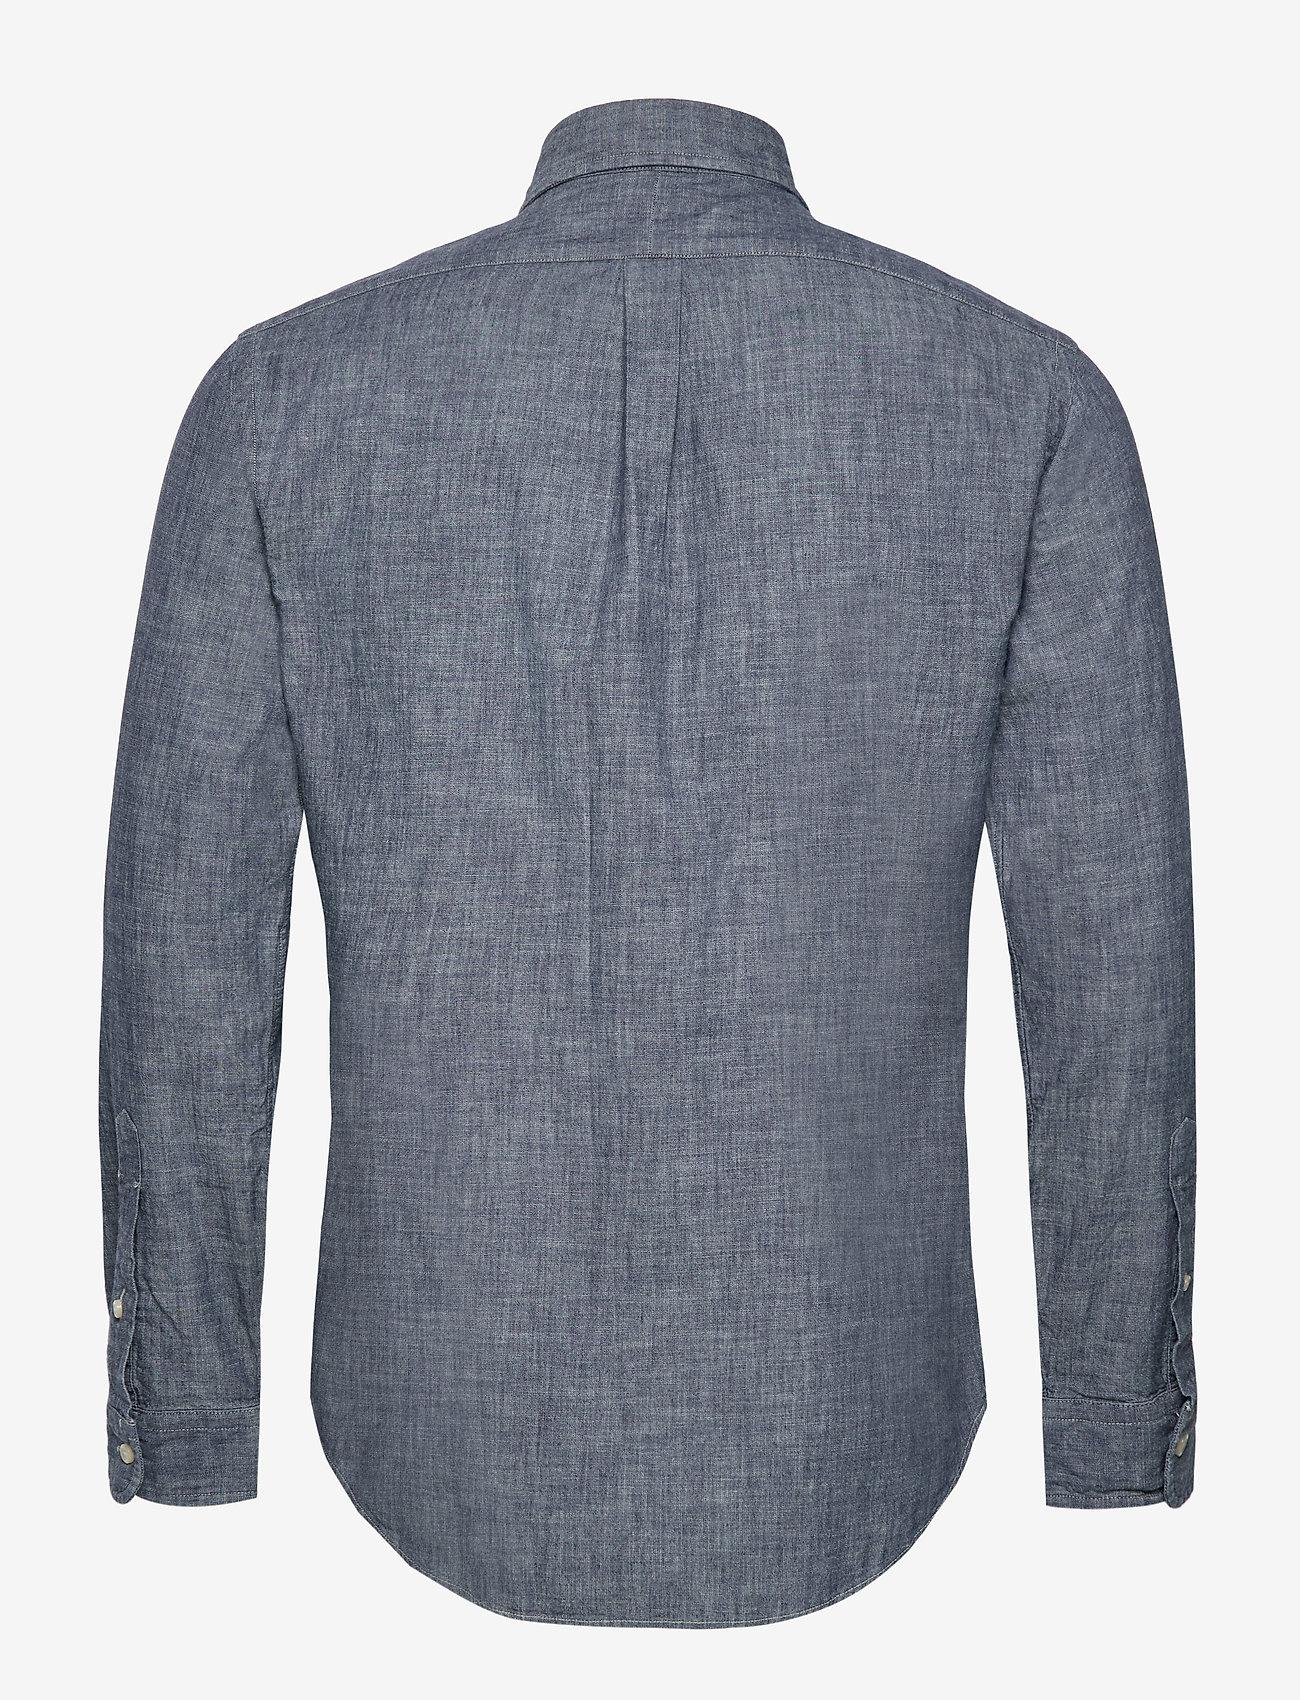 Polo Ralph Laurenslim Fit Indigo Chambray Shirt - Hemden